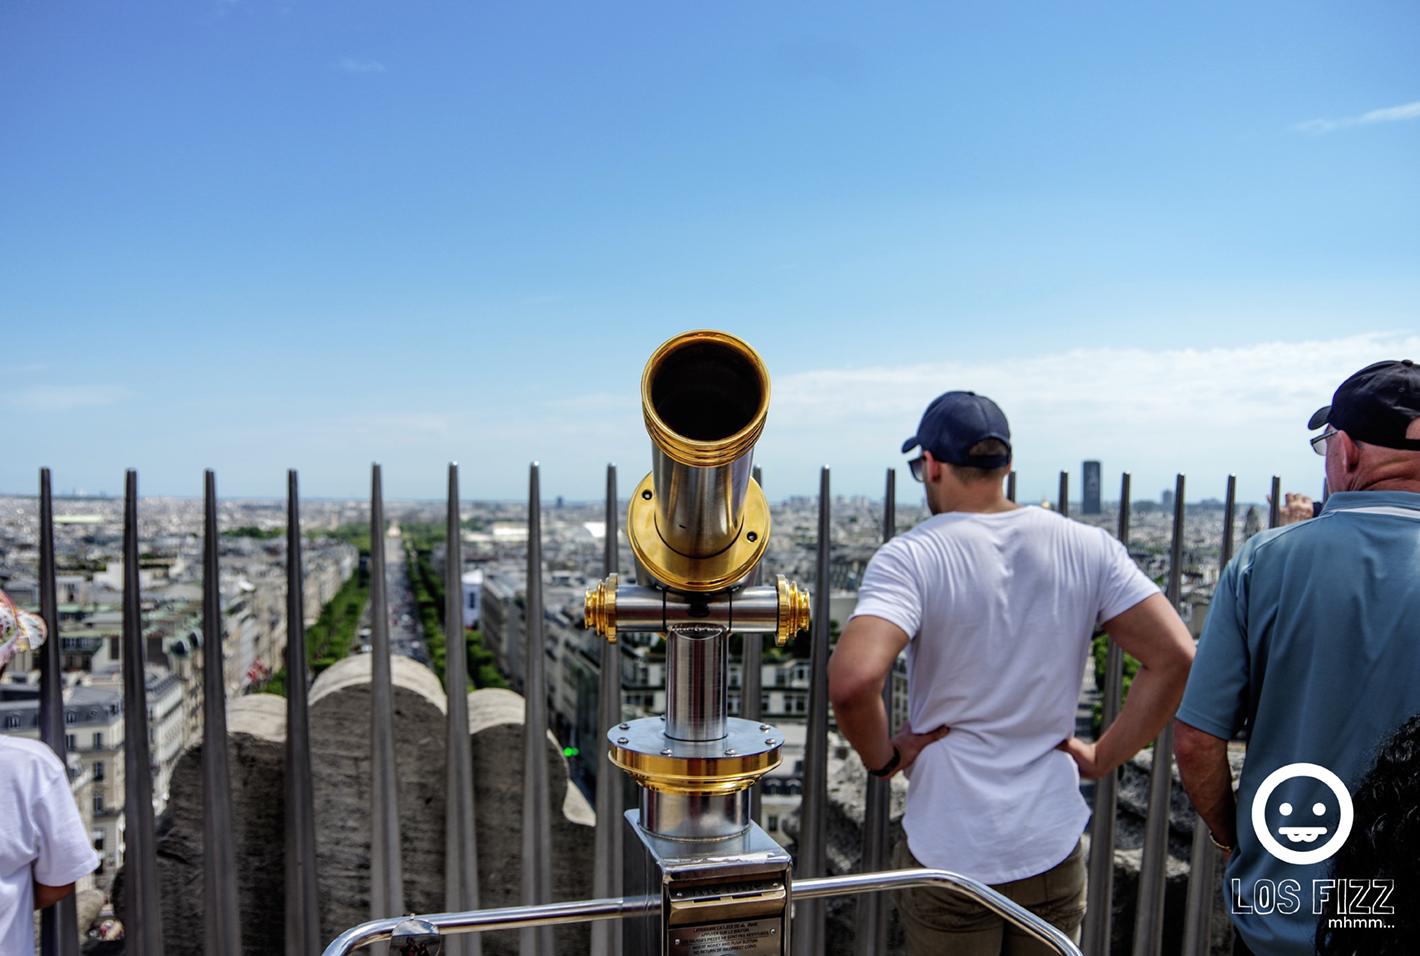 Arc de Triomphe lookout, binoculars in Paris, France. Photo By LosFizz.